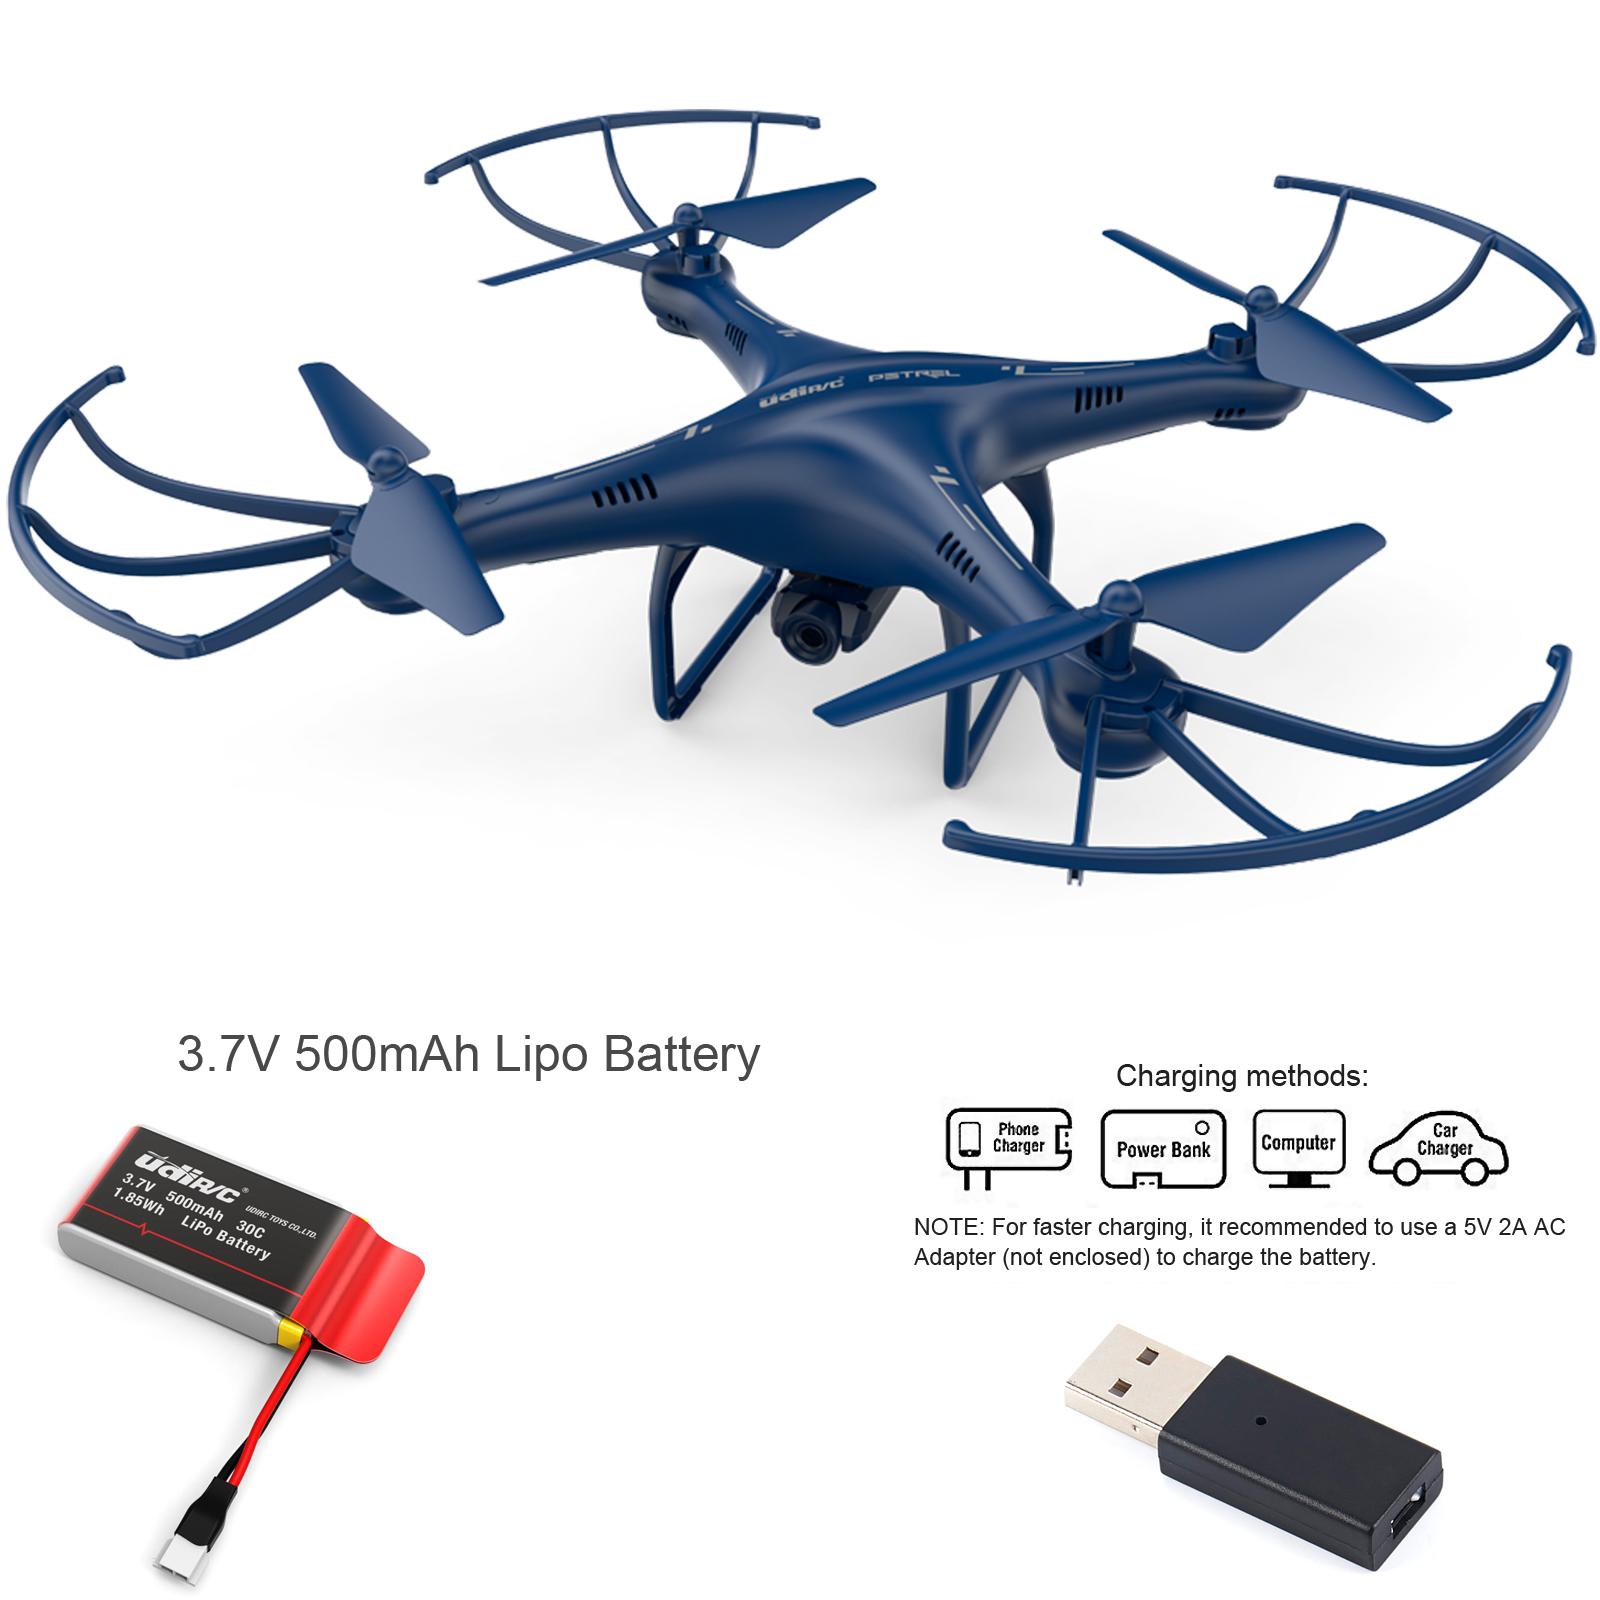 Udi Petrel U42w Fpv Drone 2 4 Ghz Rc Quadcopter With Hd